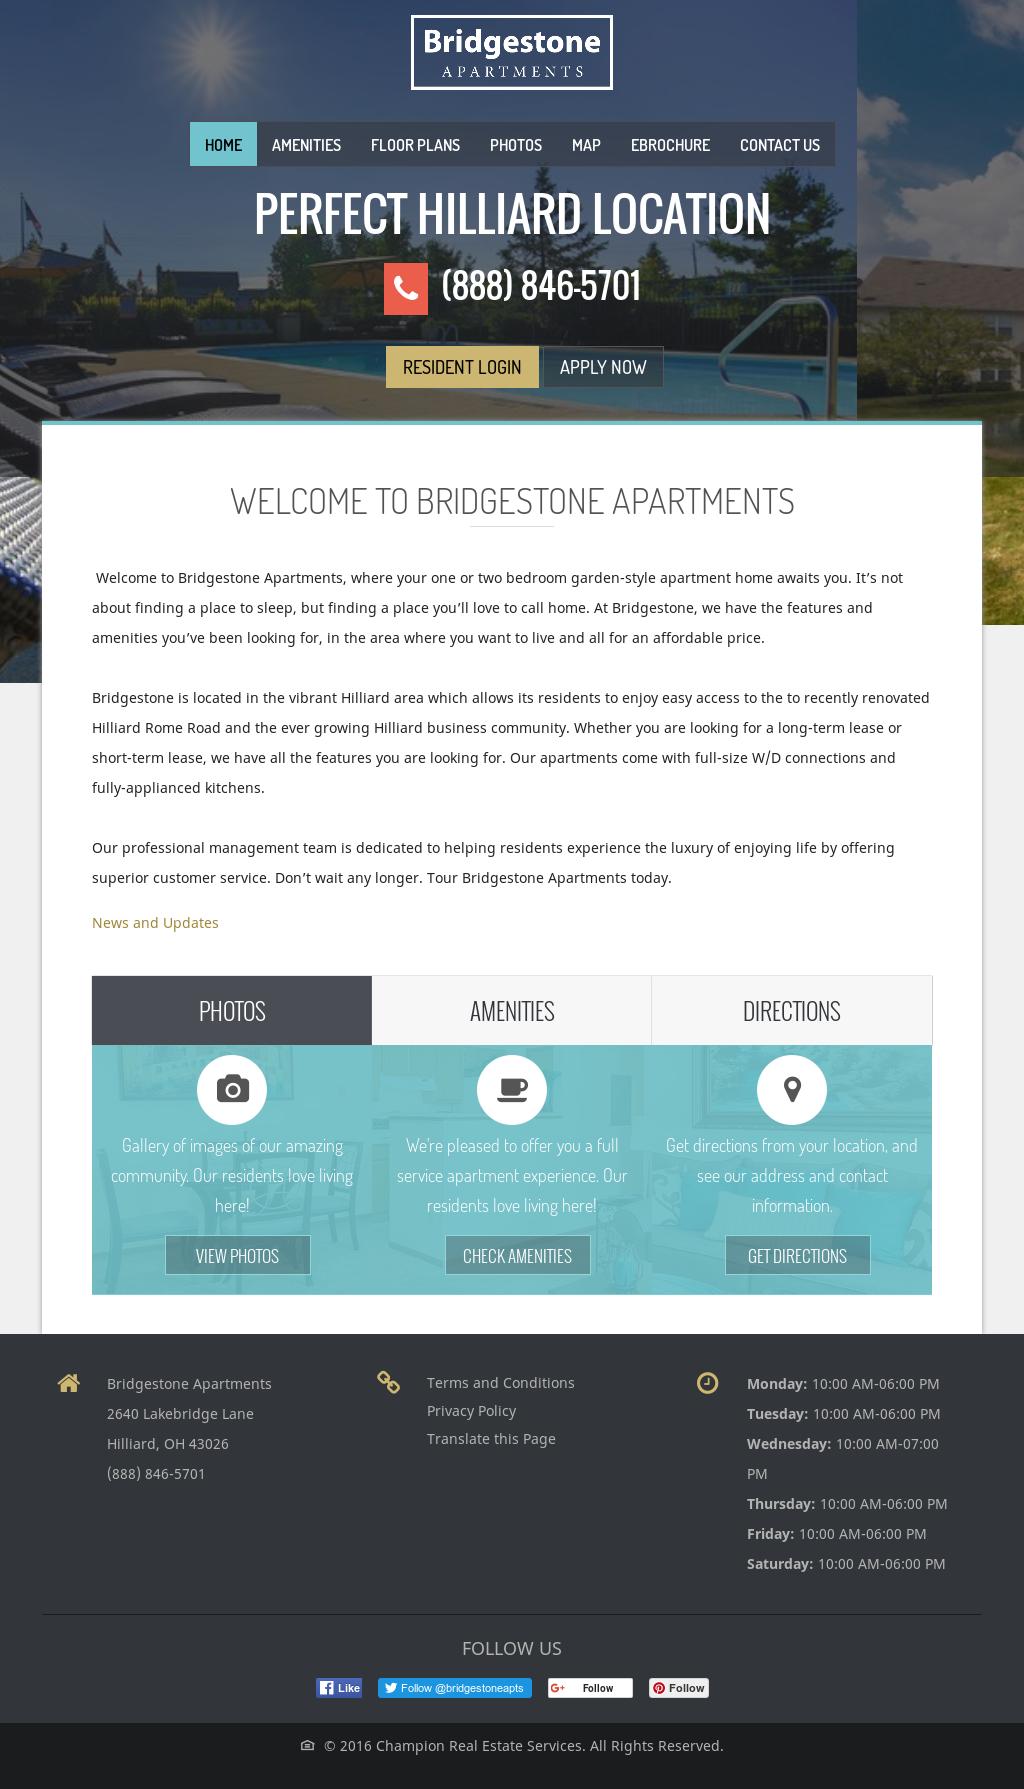 Bridgestone Apartments Competitors, Revenue and Employees